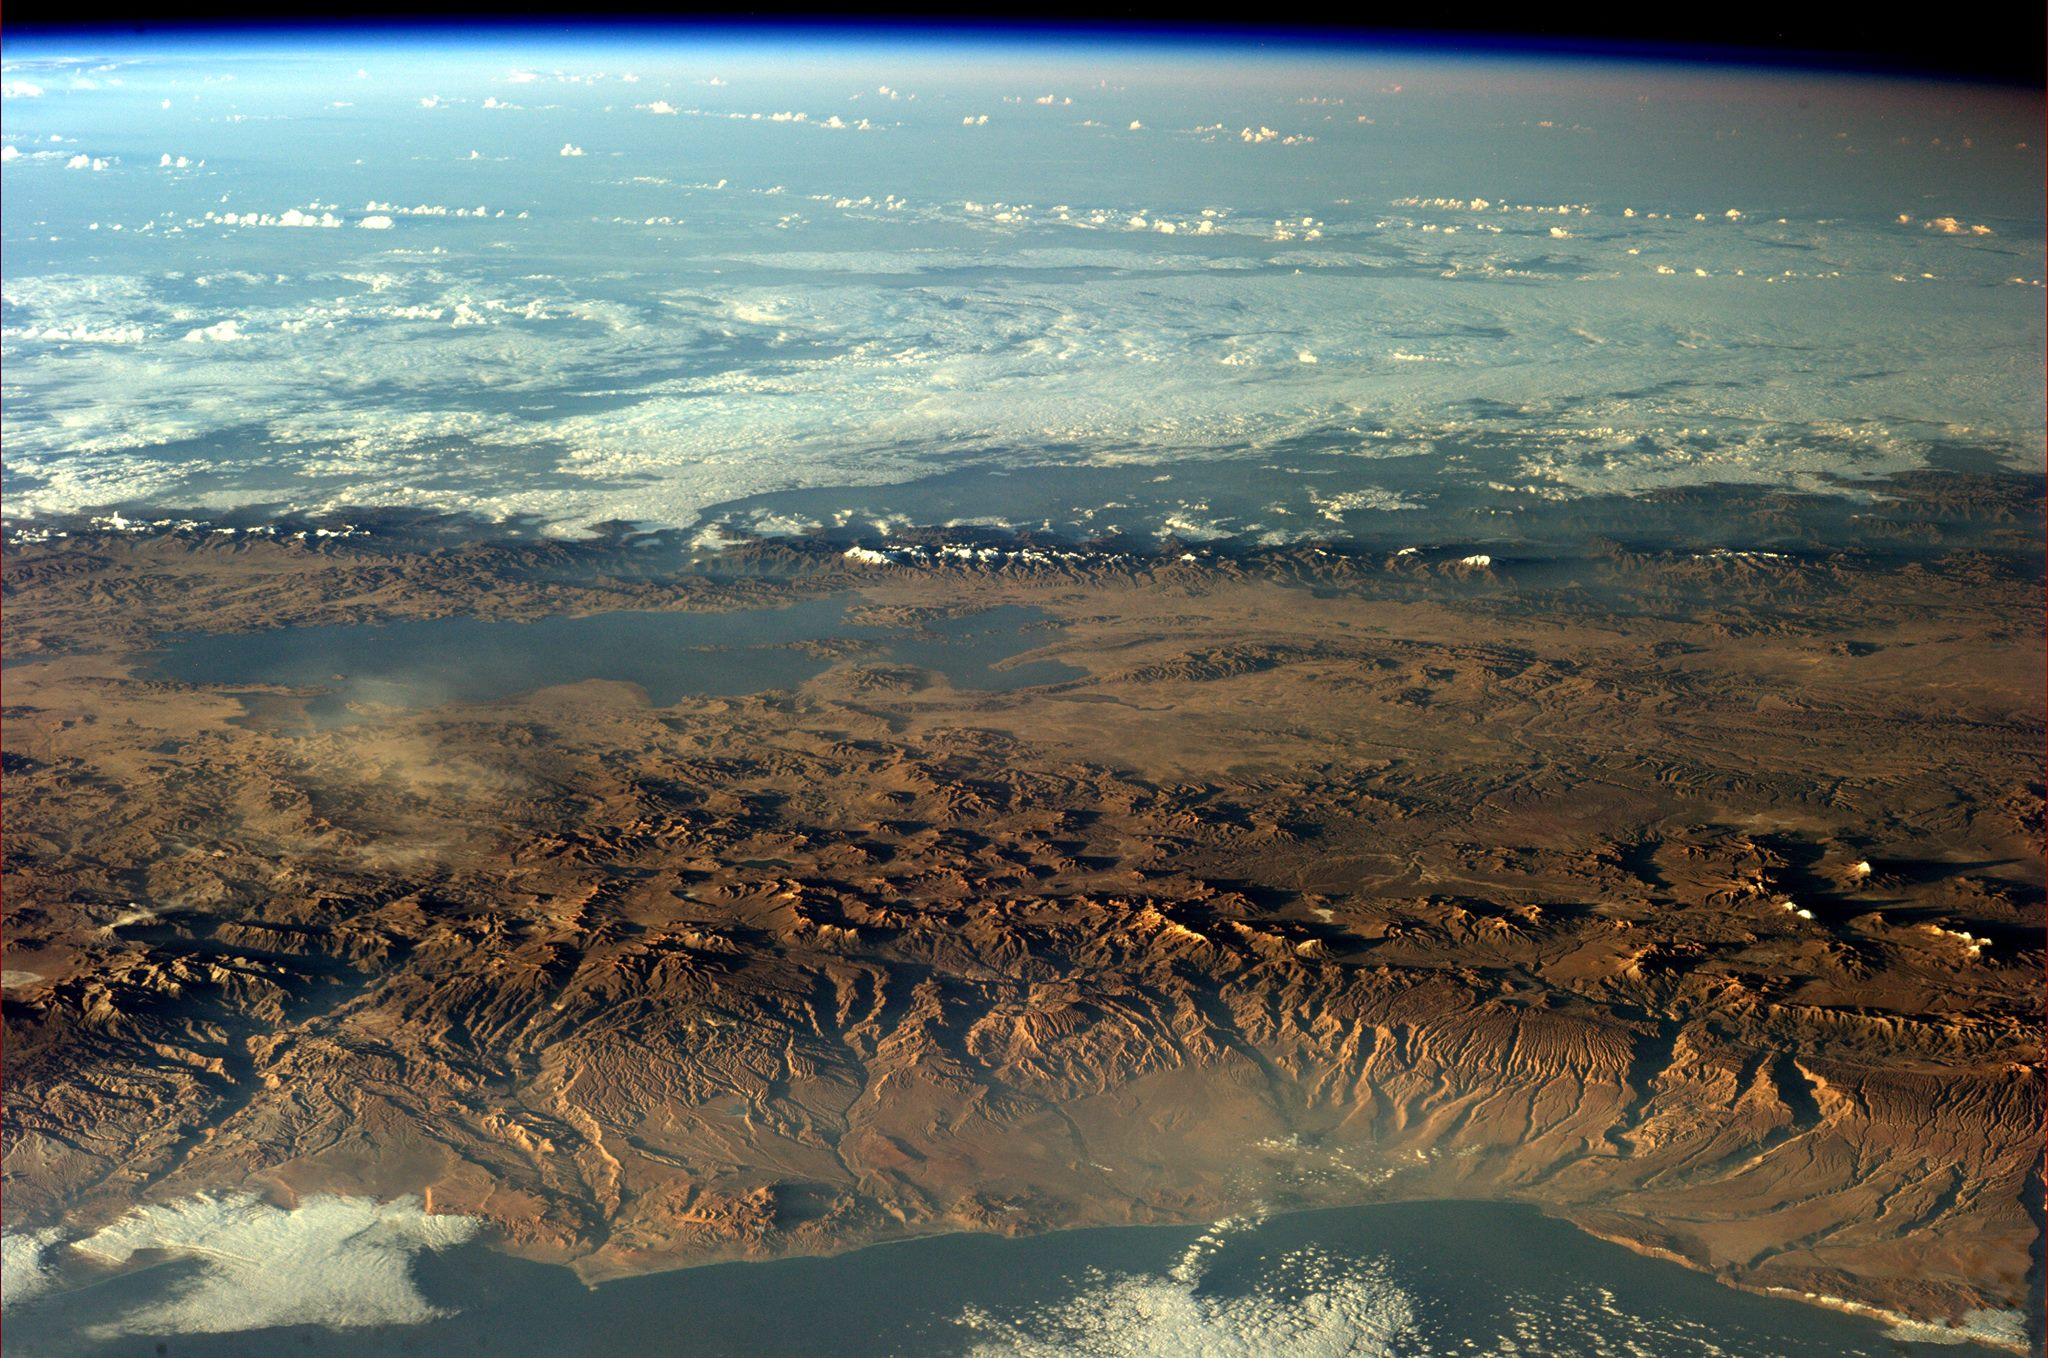 Photos astronaut Alexander Gerst 17